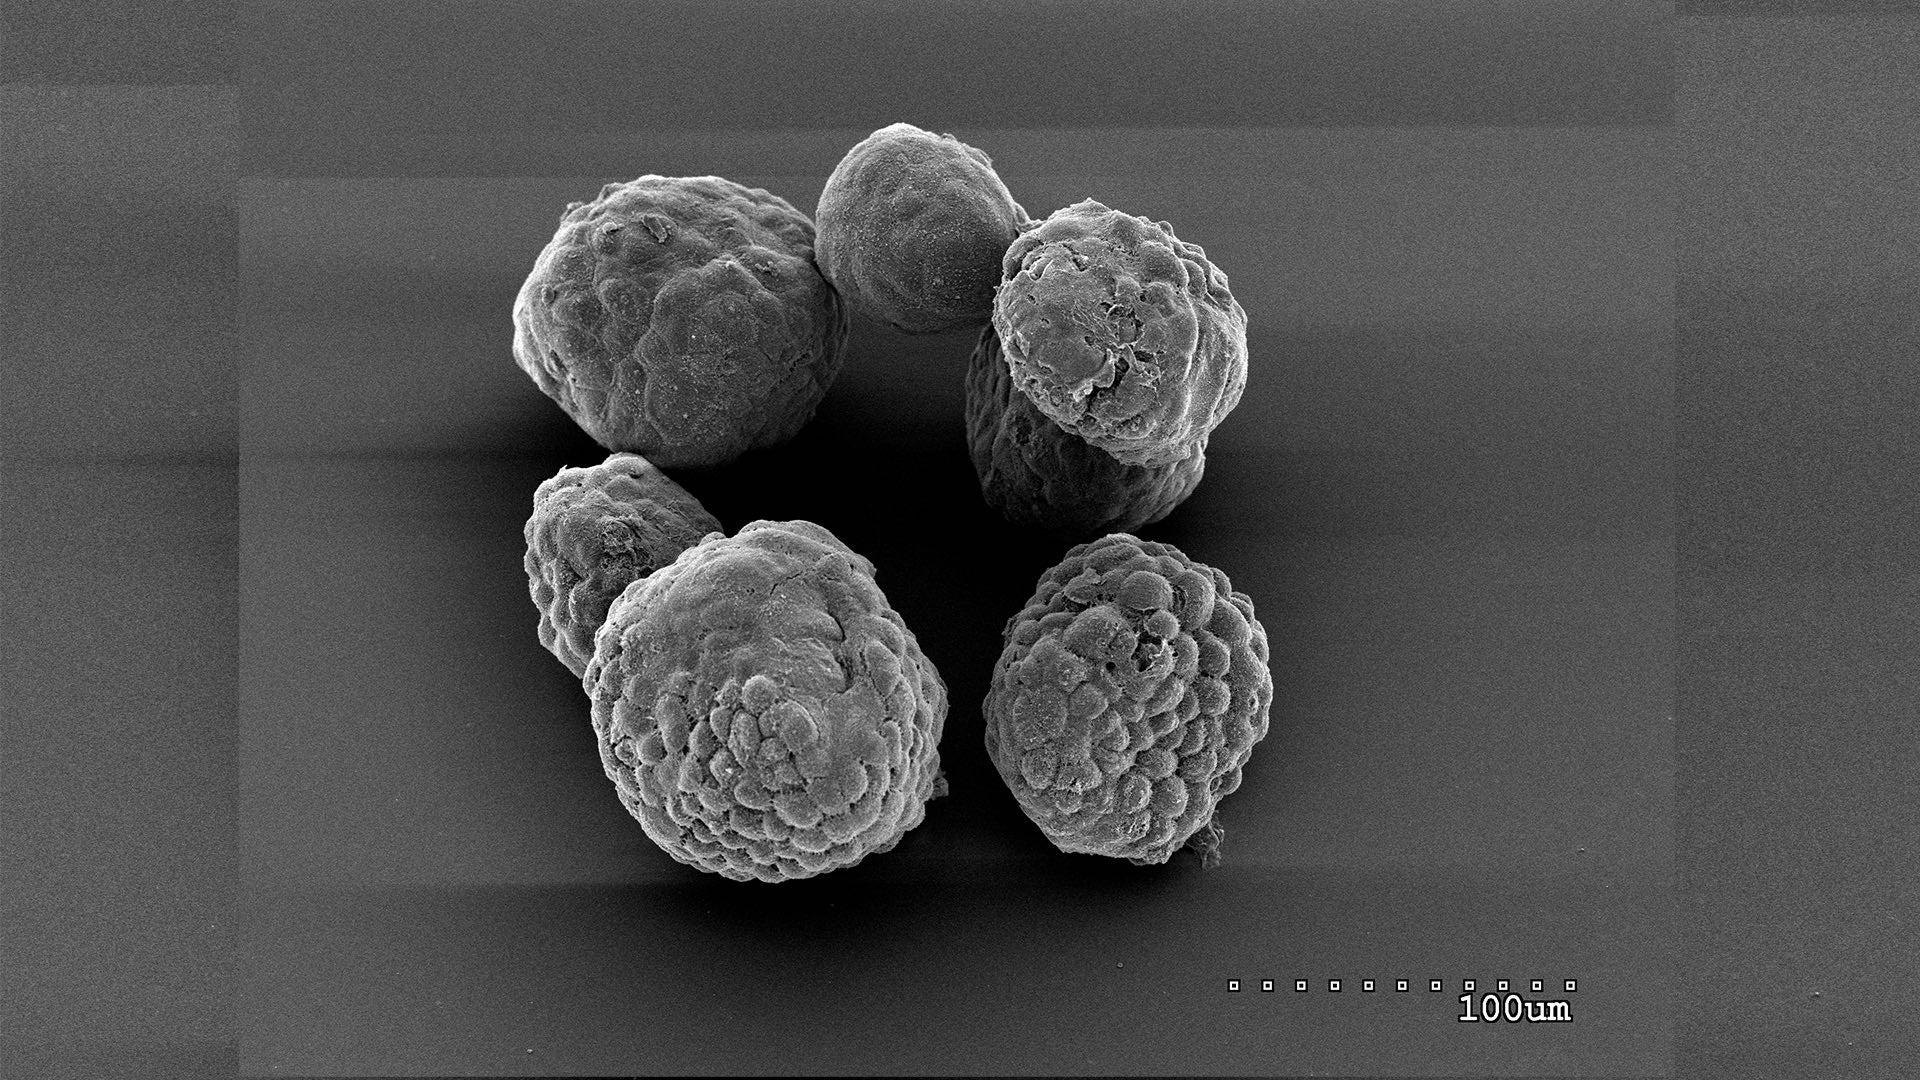 image of pancreatic tumor organoids in mouse